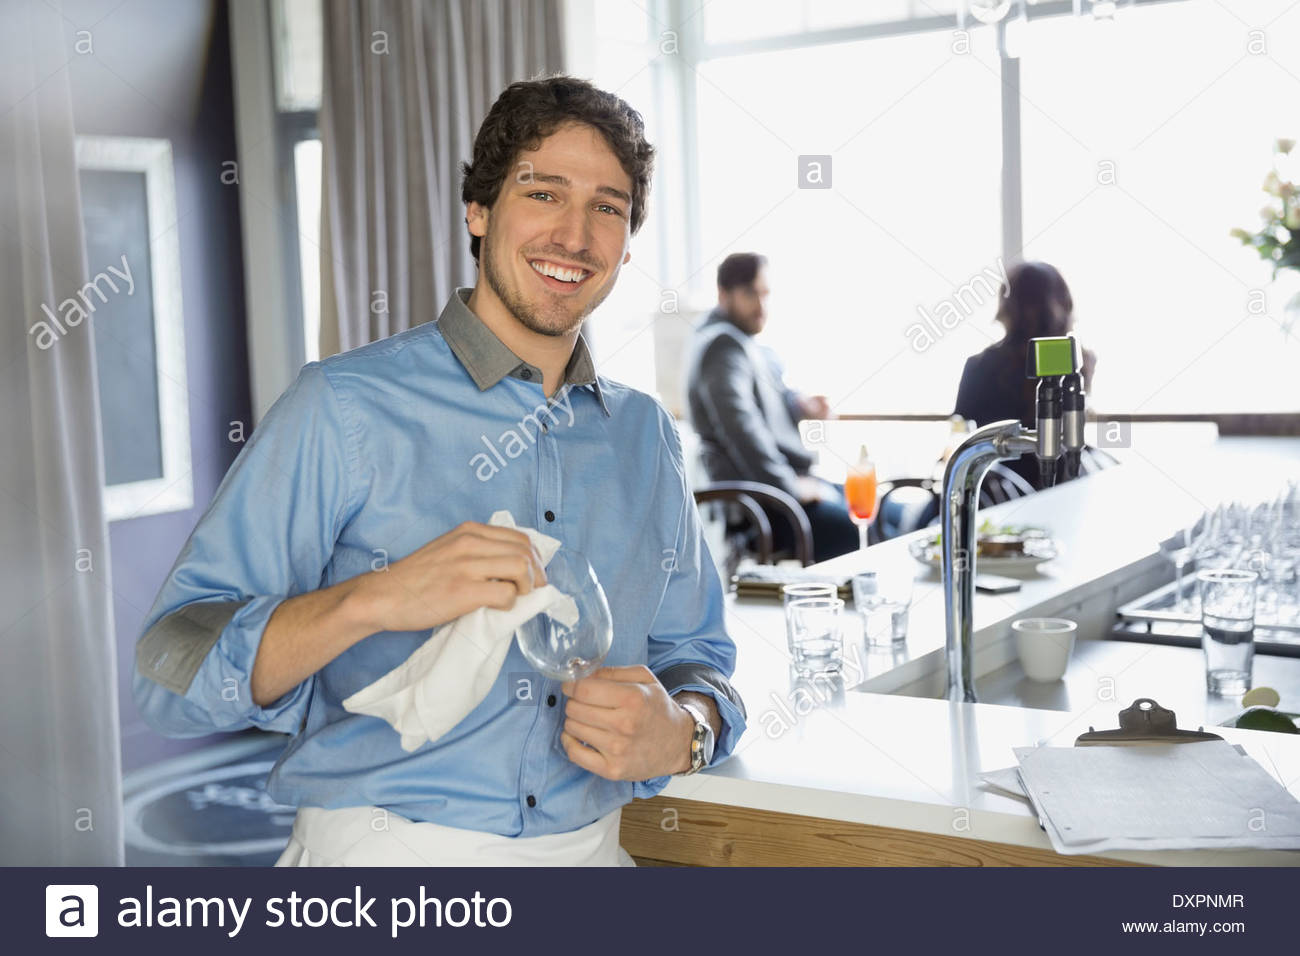 Portrait of bartender drying wine glass in bar - Stock Image